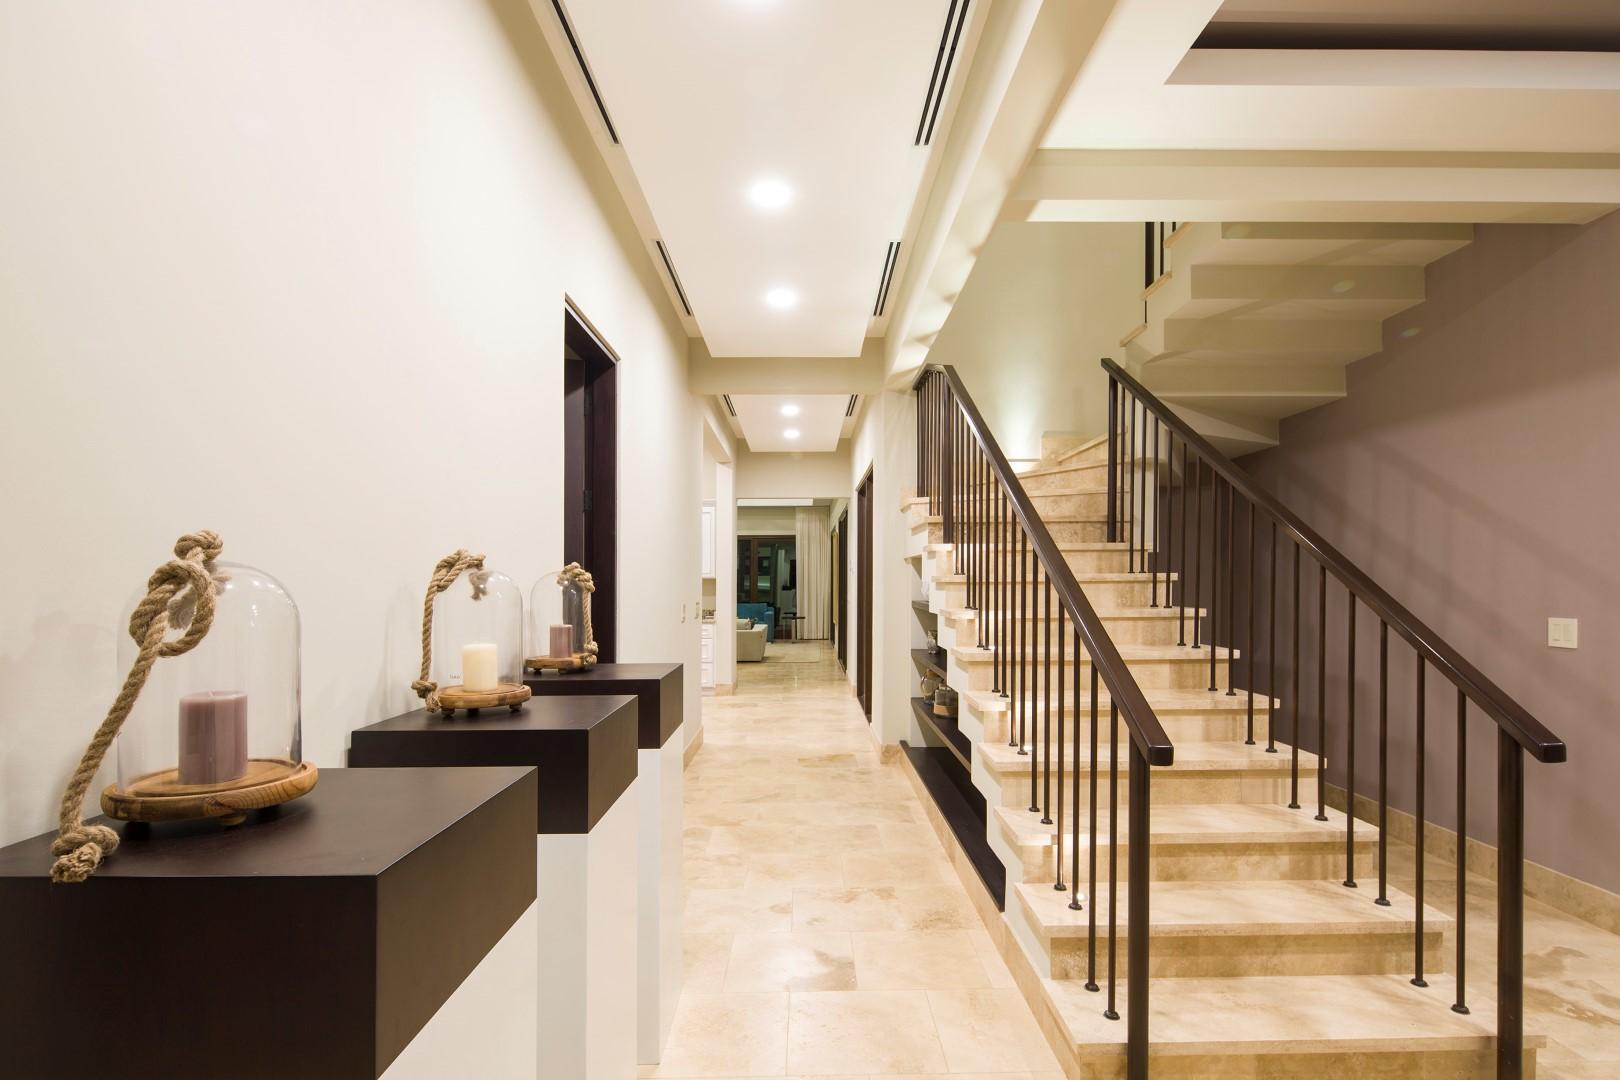 Hallway to paradise!